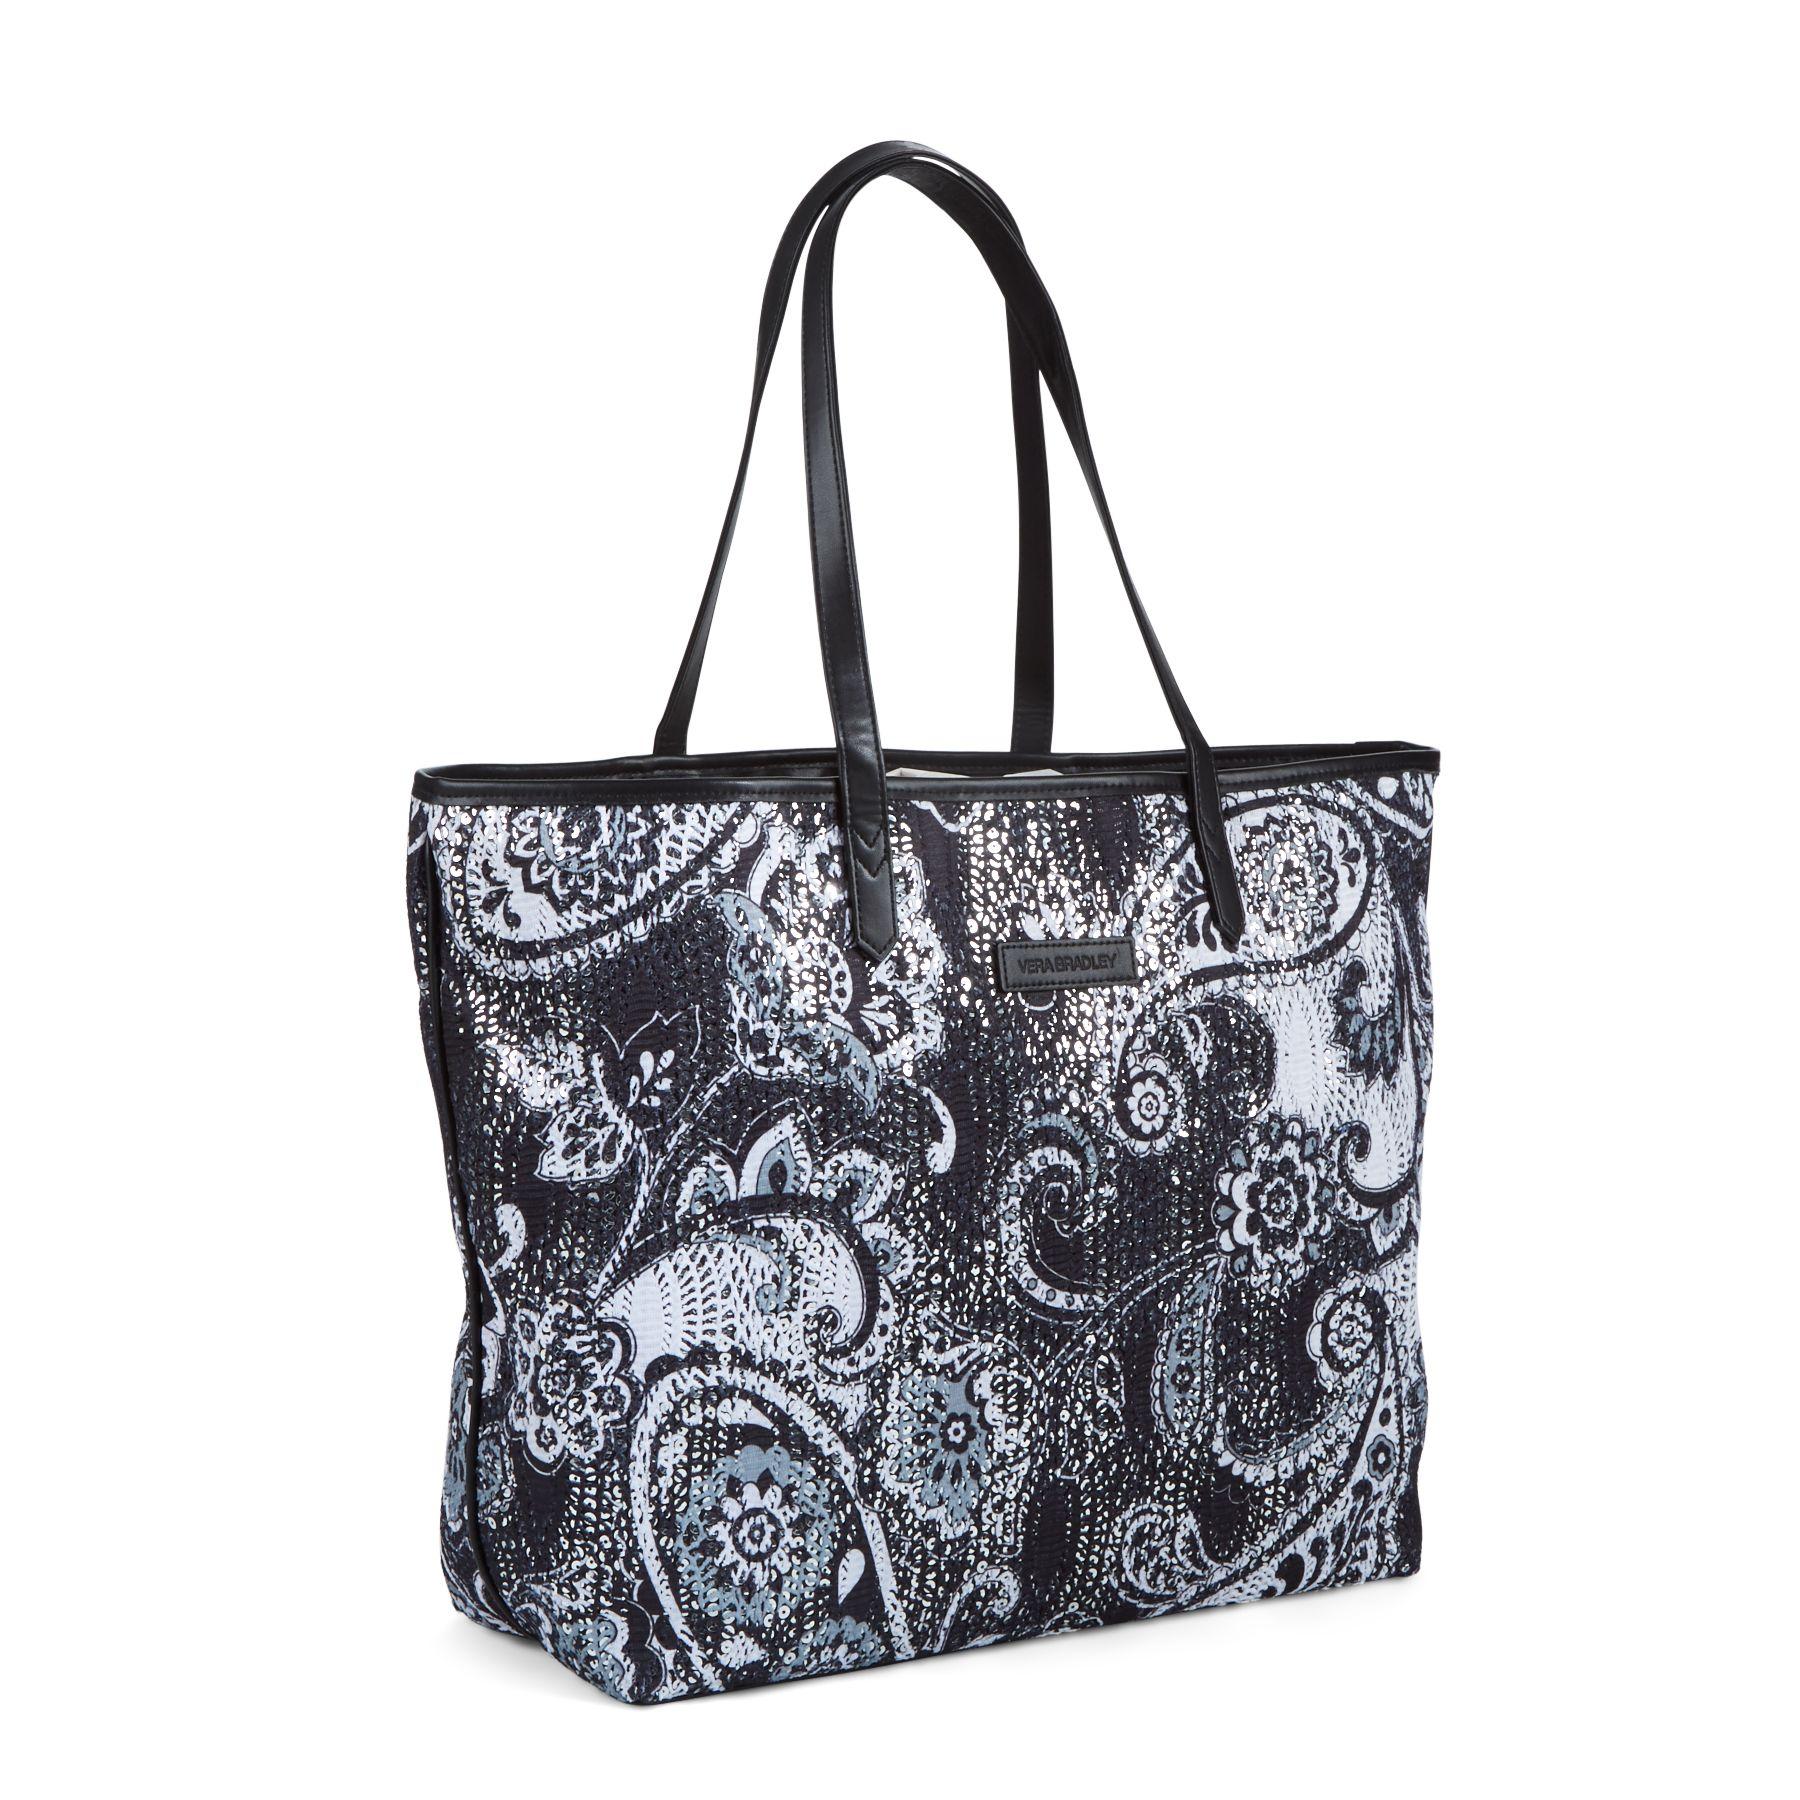 Vera Bradley Sparkle Tote Bag Martlocal